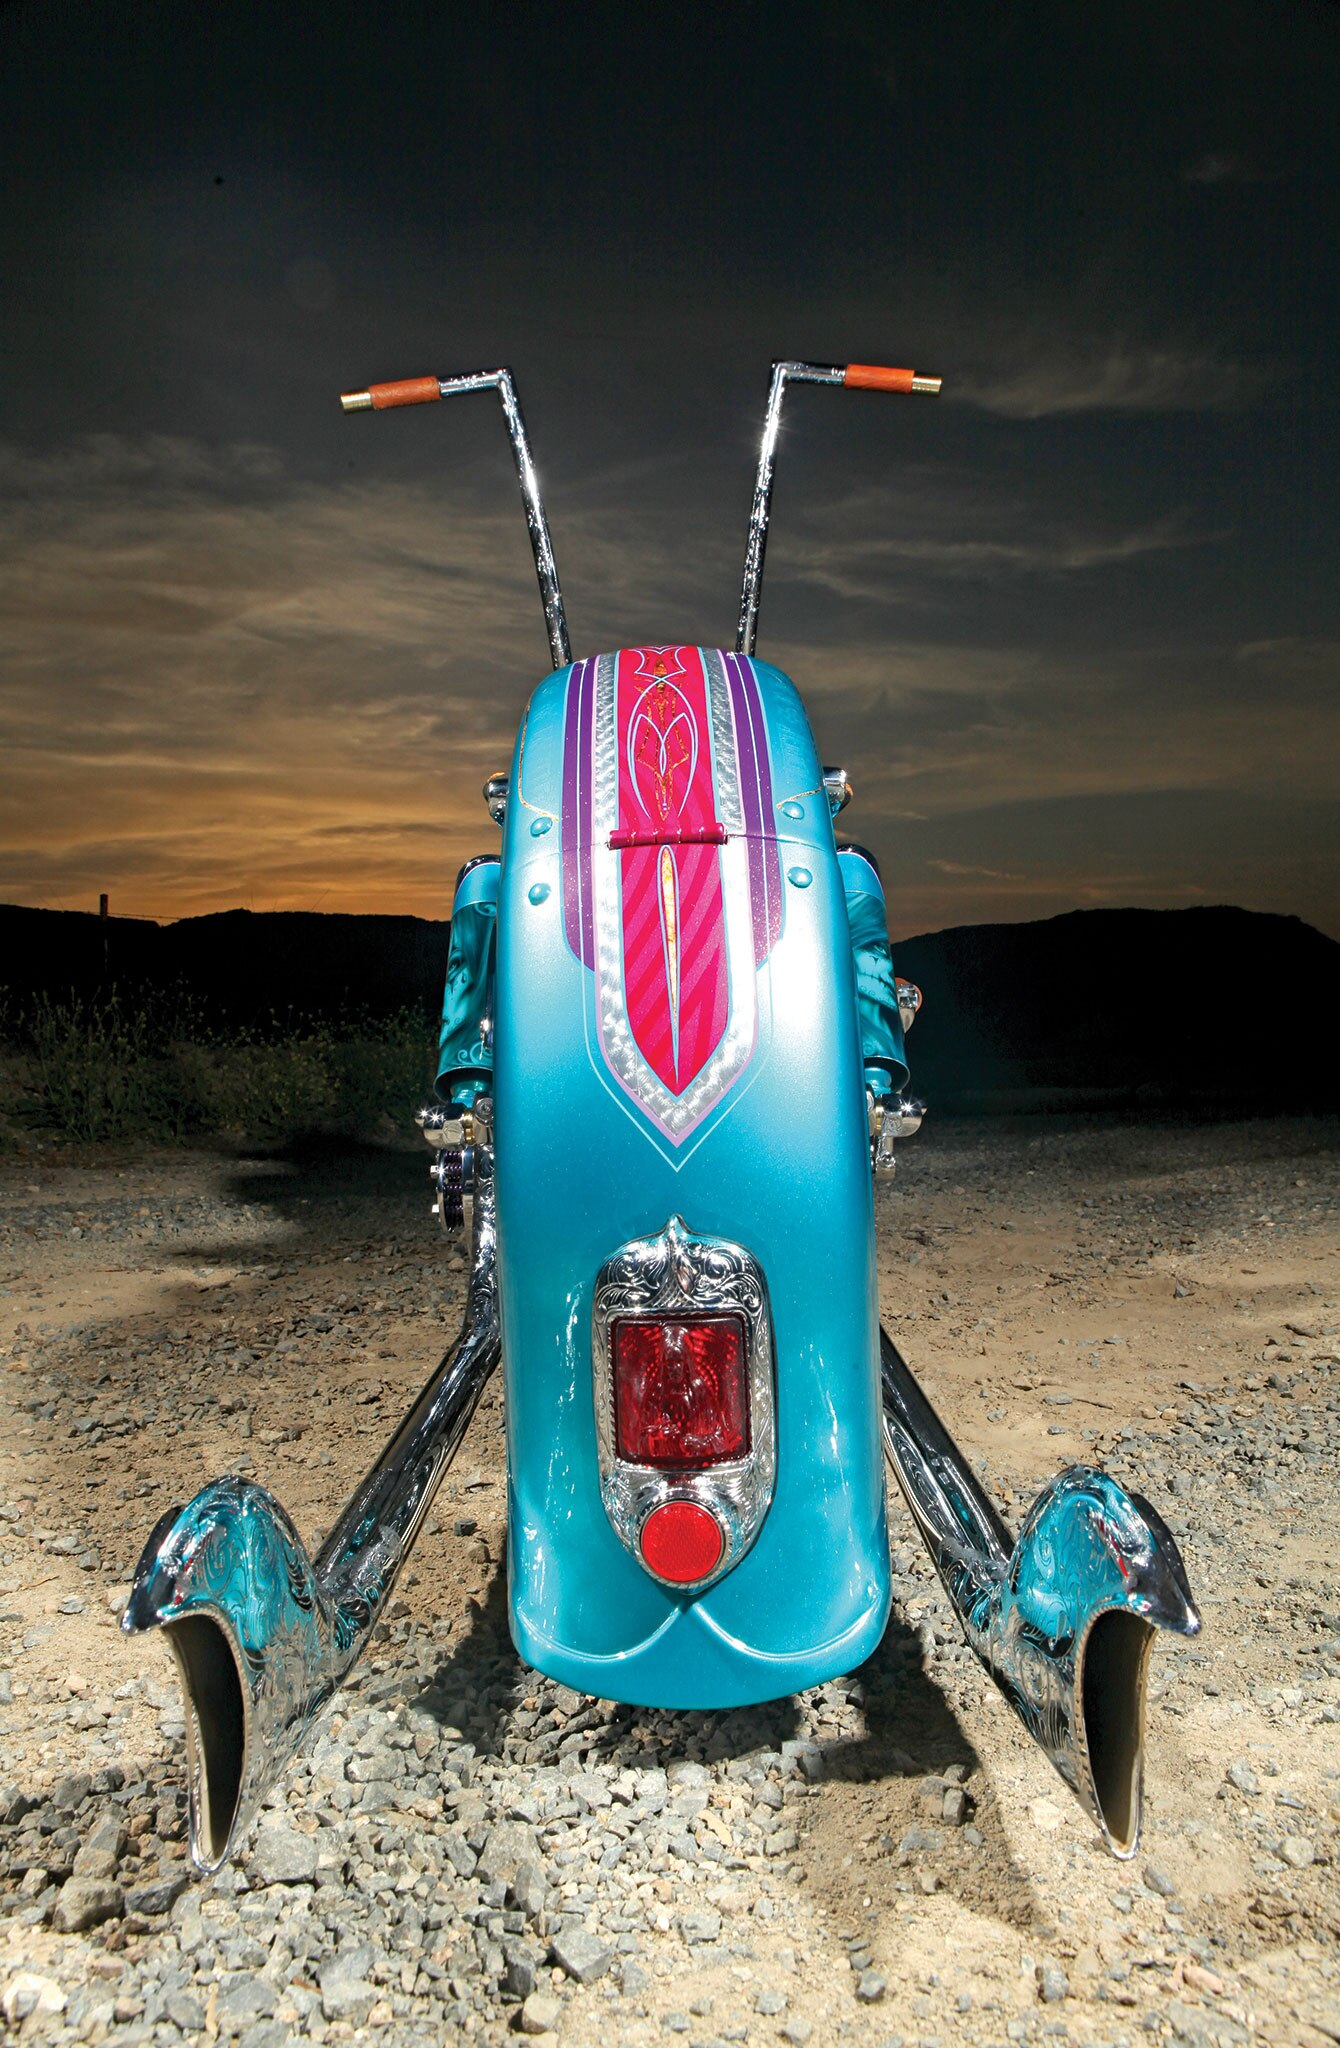 1974 Harley Davidson Shovelhead Old S Cool Lowrider